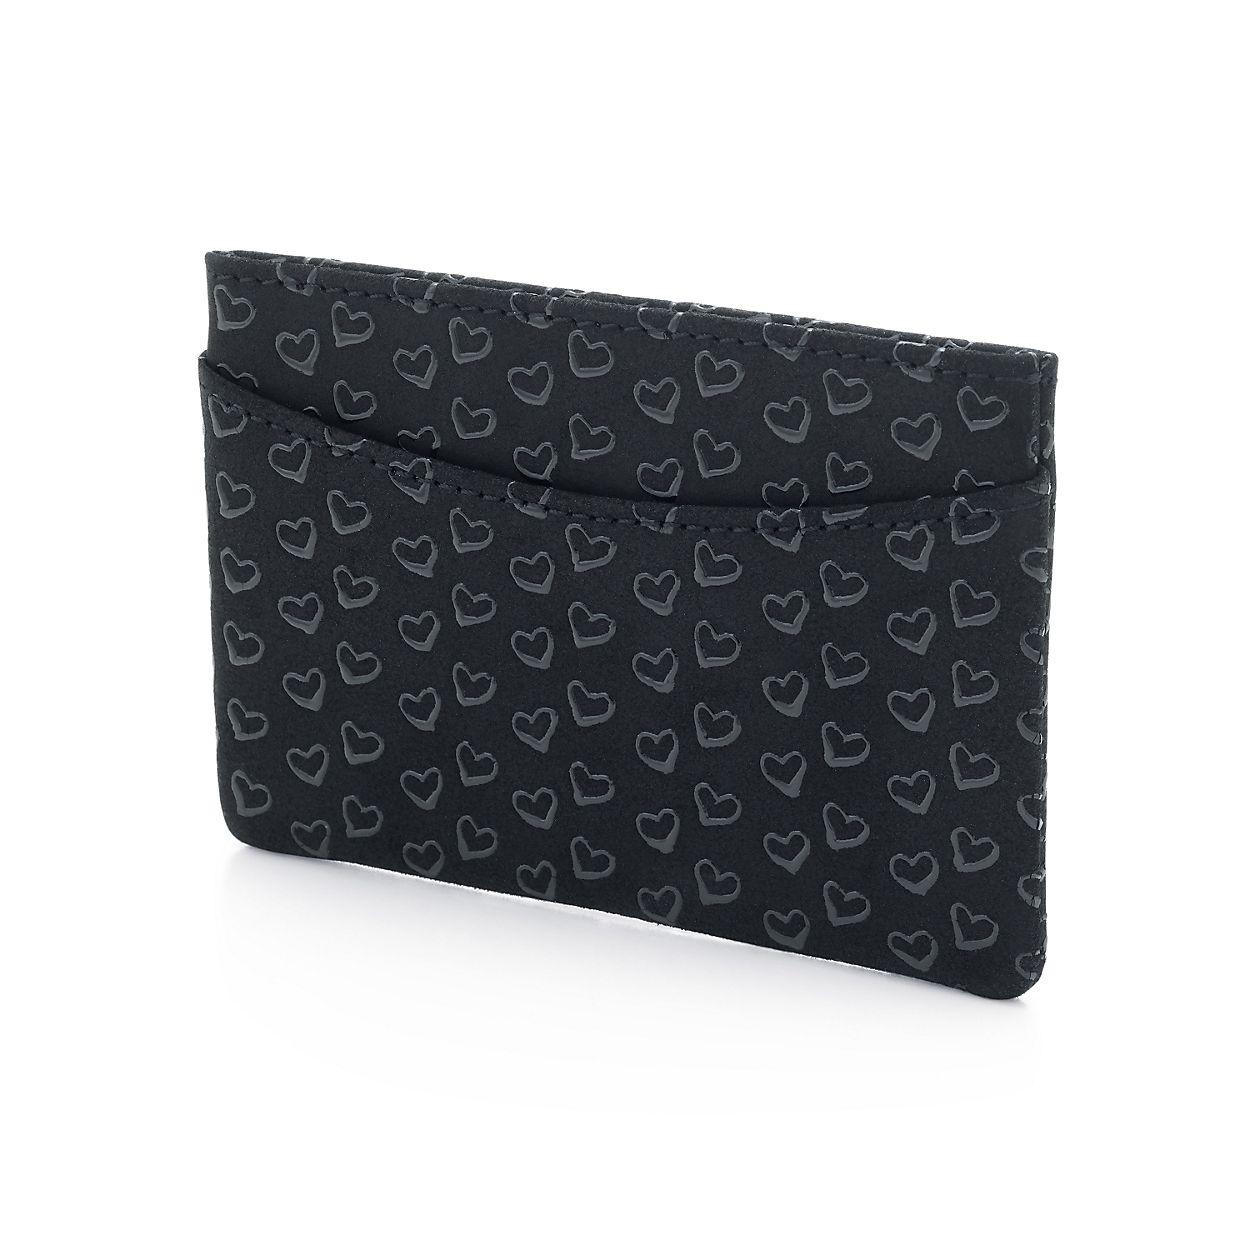 Elsa Peretti card case in black leather with lacquered Open Hearts Tiffany & Co. DgOlQQhYz1